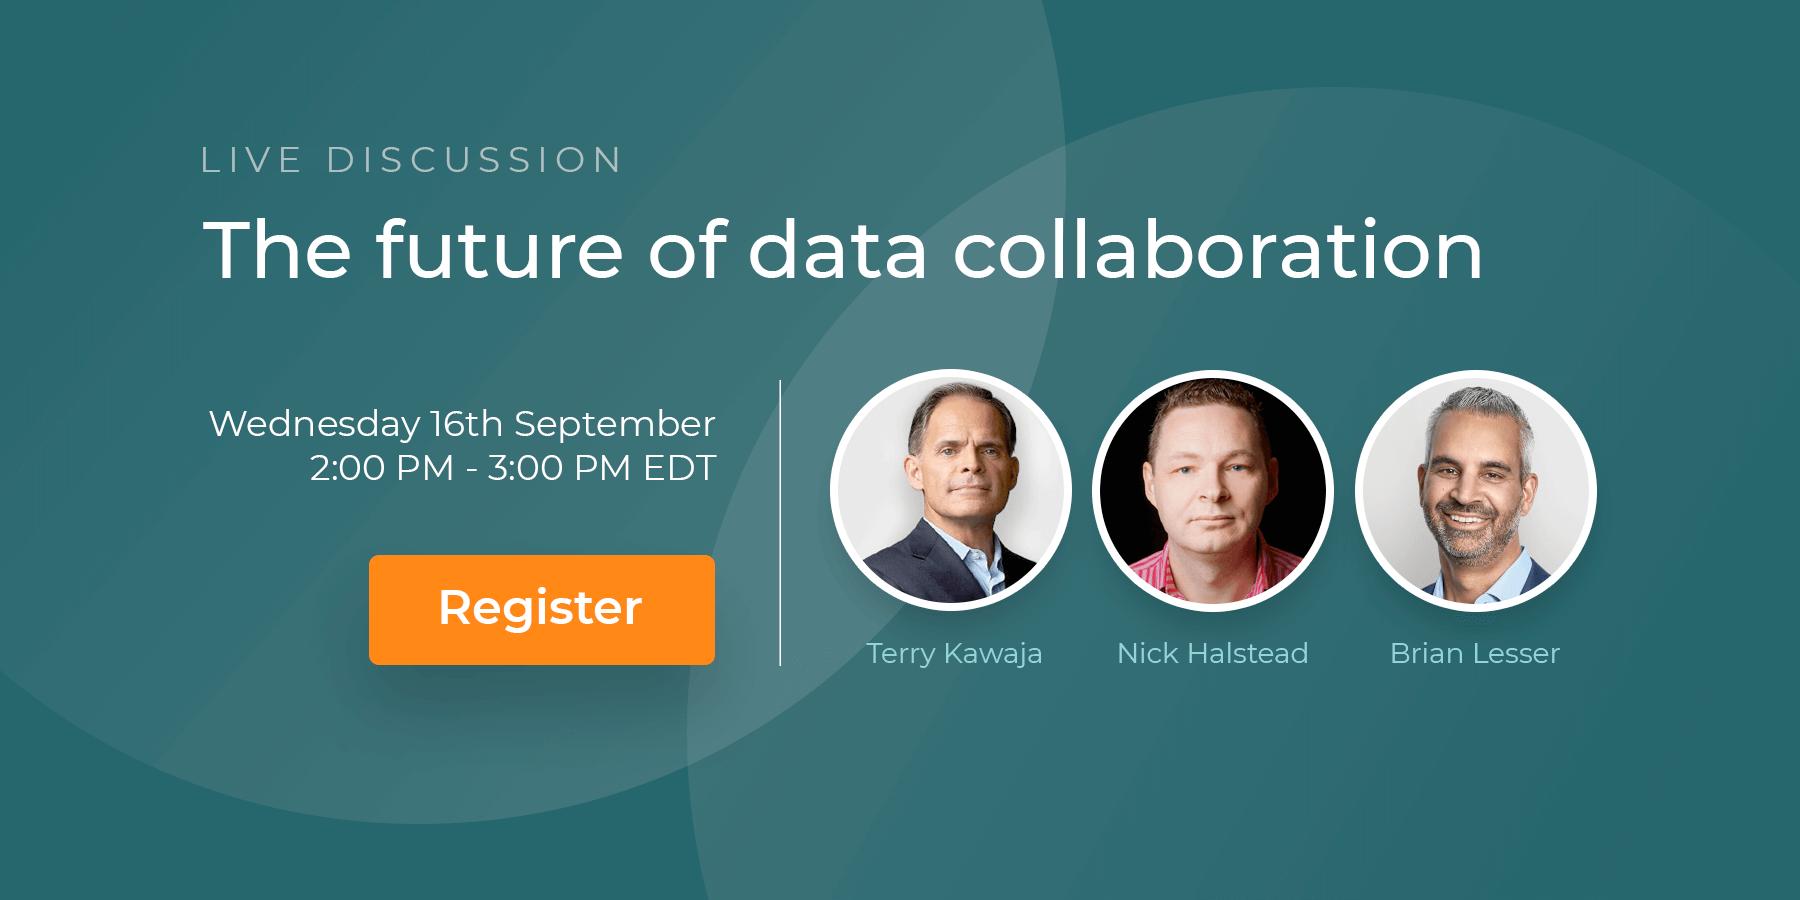 Live Discussion: The future of data collaboration